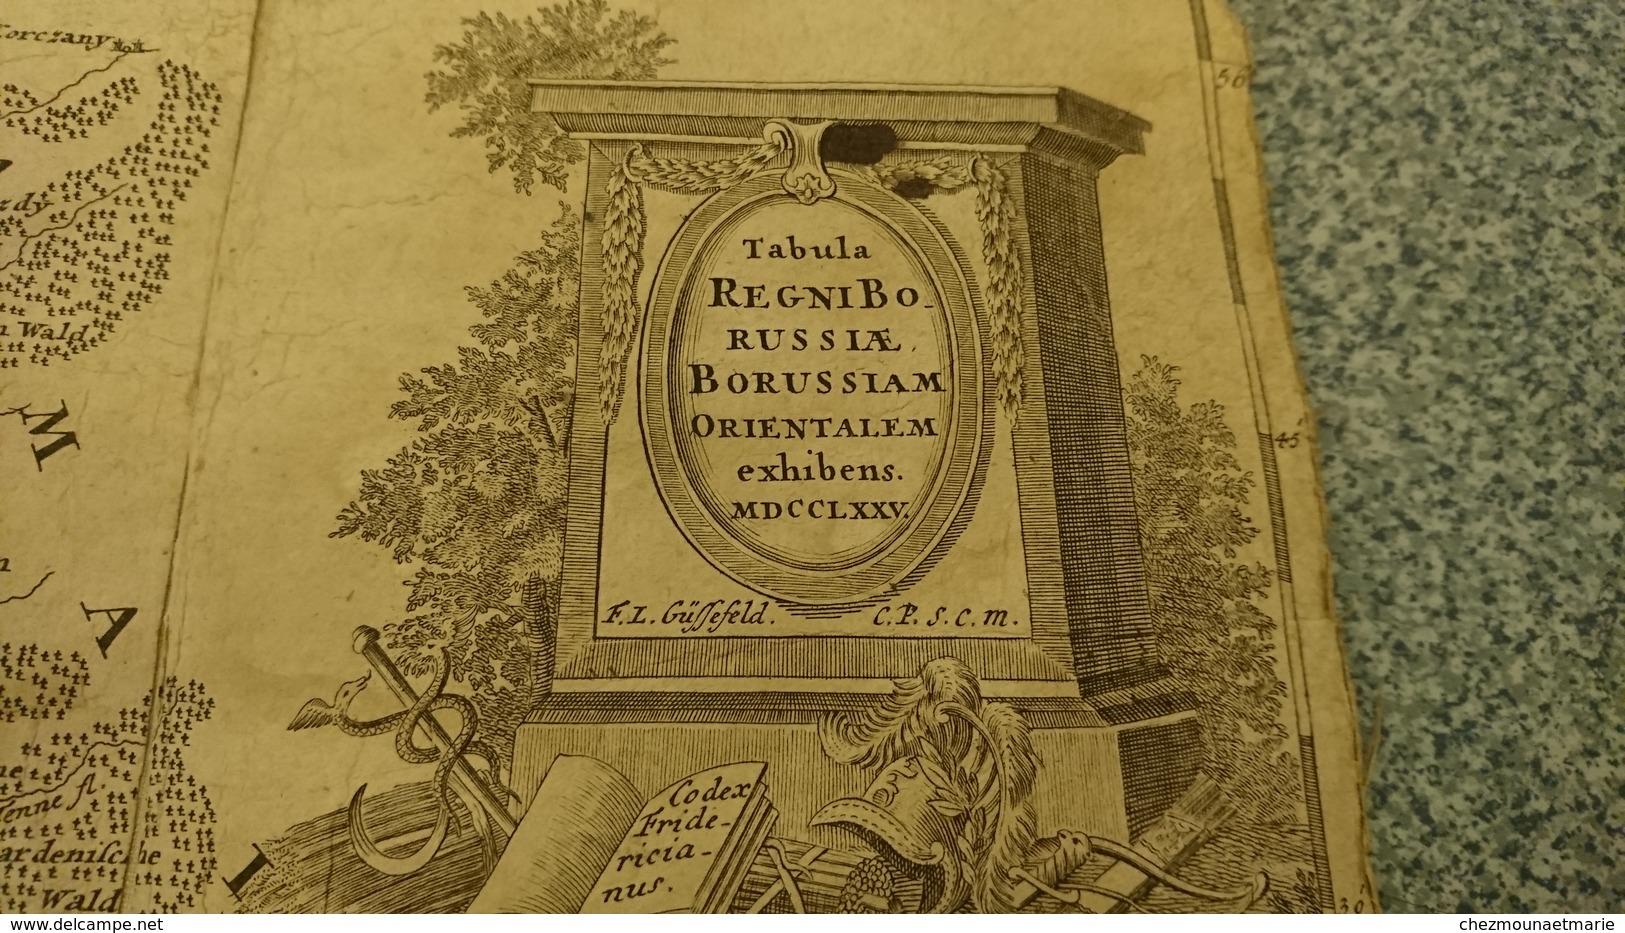 TABULA REGNI BORUSSIAE BORUSSIAM ORIENTALEM EXHIBENS 1775 GUSSEFELD NUREMBERG CARTE PRUSSE - Cartes Géographiques